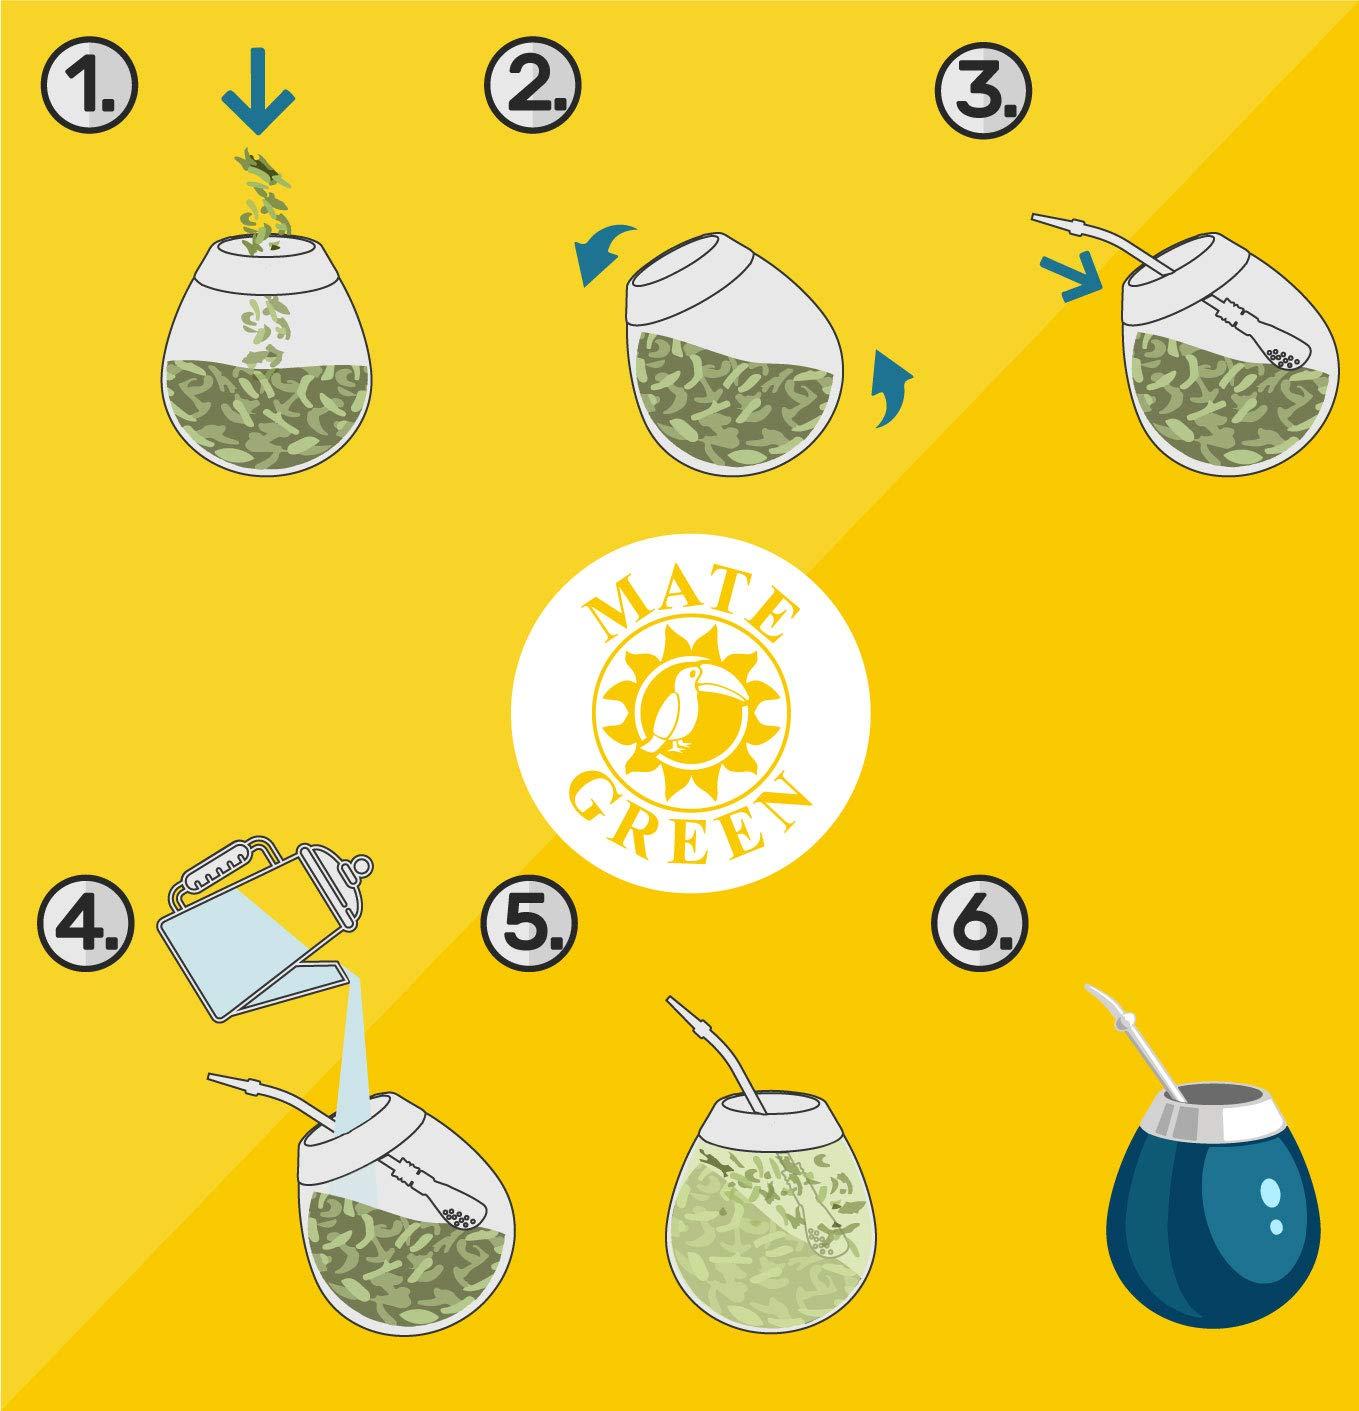 Yerba-Mate-Green-Lemon-Brasilianischer-Mate-Tee-1000g-Ser-Zitrus-Mate-Tee-mit-Zitronengras-Zitronenschale